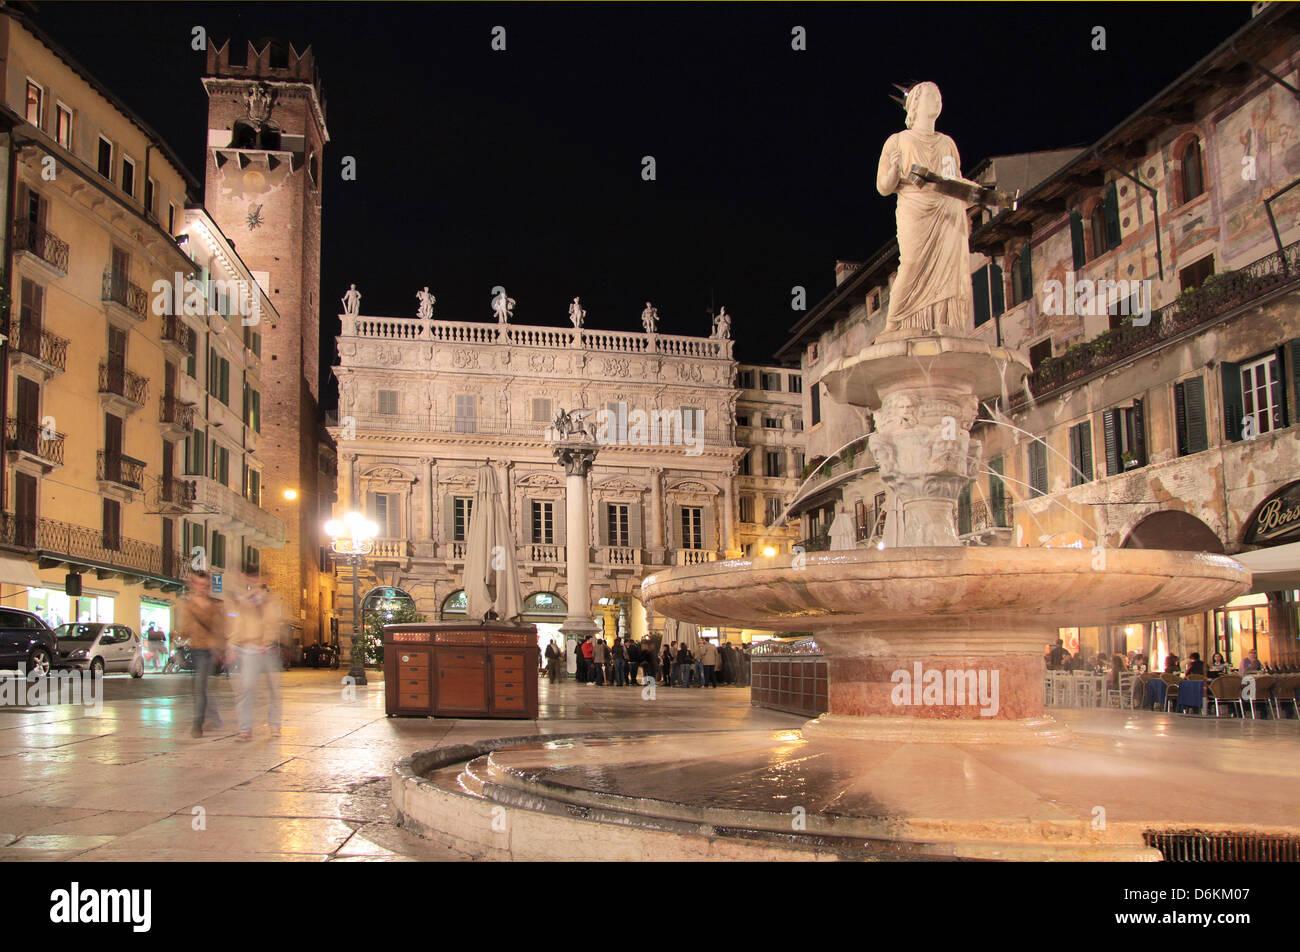 Piazza Delle Erbe in Verona bei Nacht, Veneto, Italien Stockbild